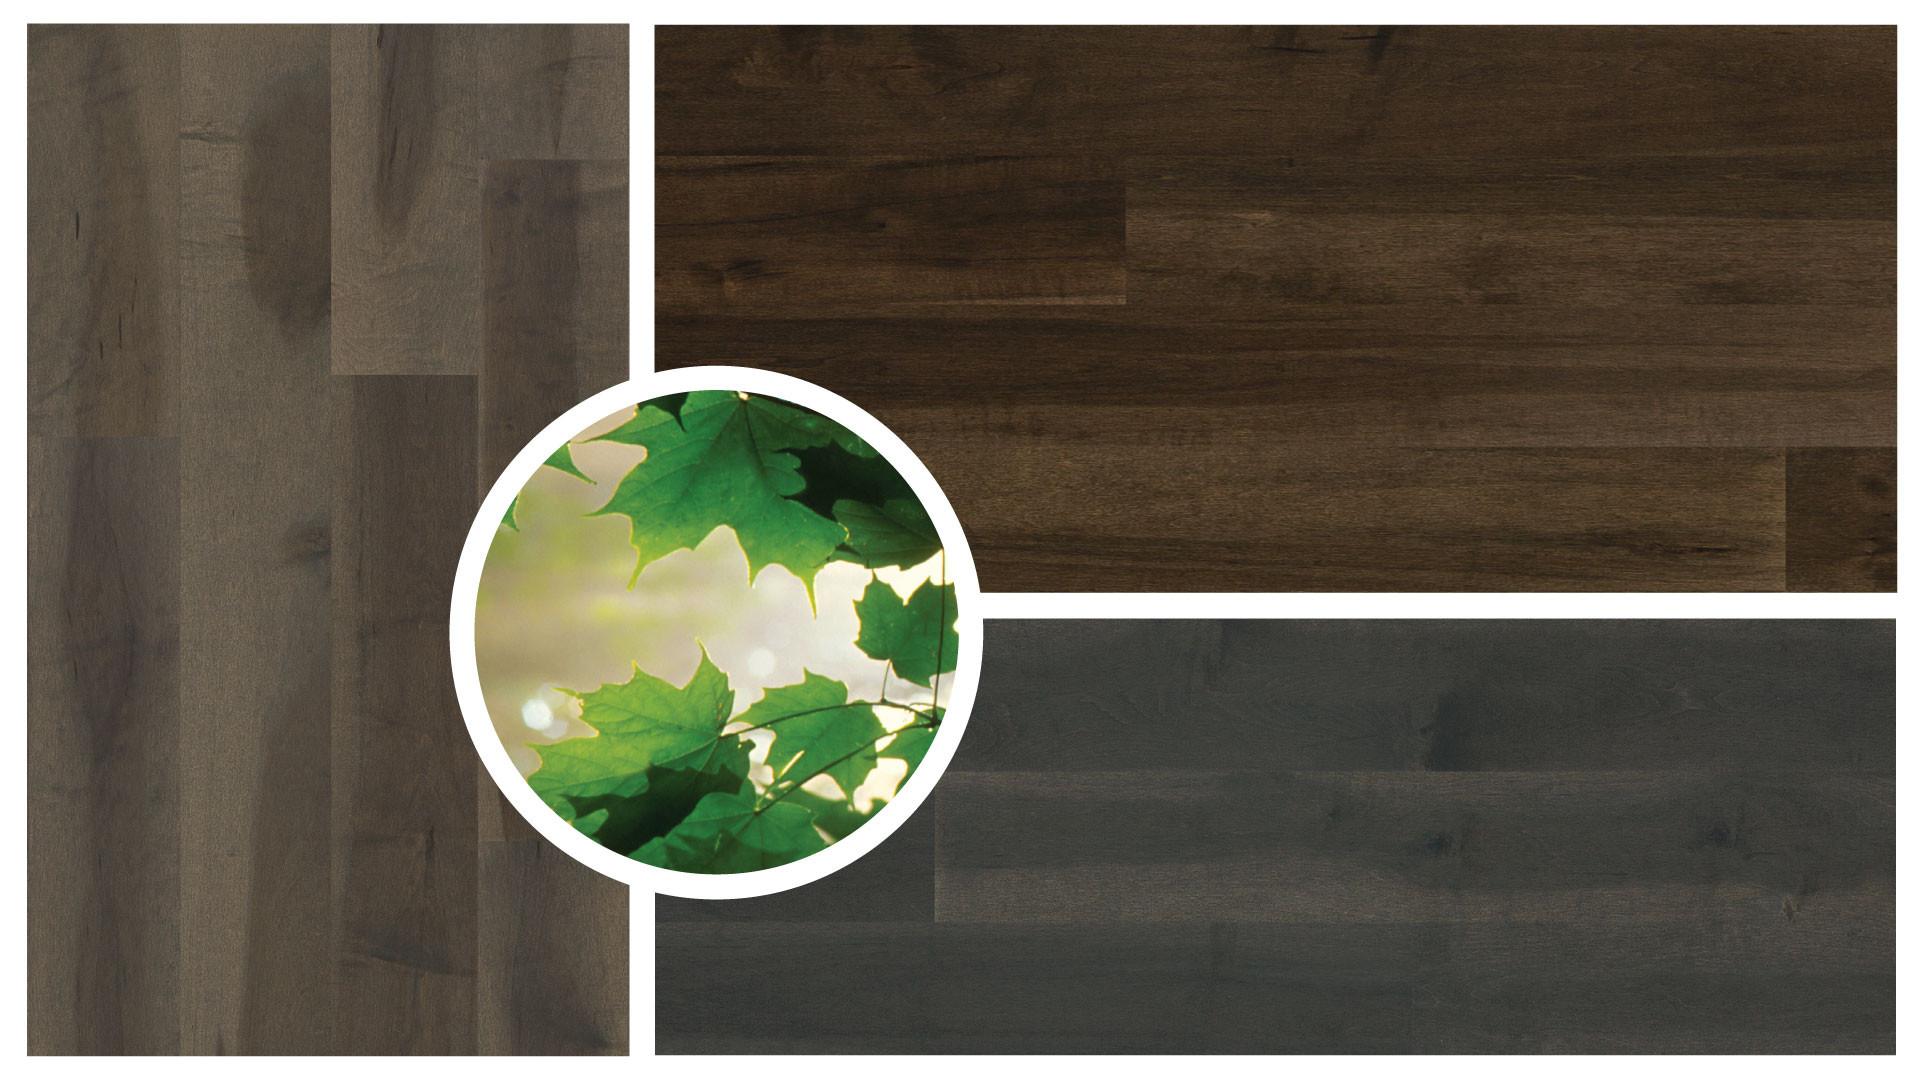 hardwood floor installation boston of 4 latest hardwood flooring trends lauzon flooring pertaining to elegant organik series hardwood flooring boasts extensive tonal variation for a chameleon effect becoming lighter or darker depending on the lighting and